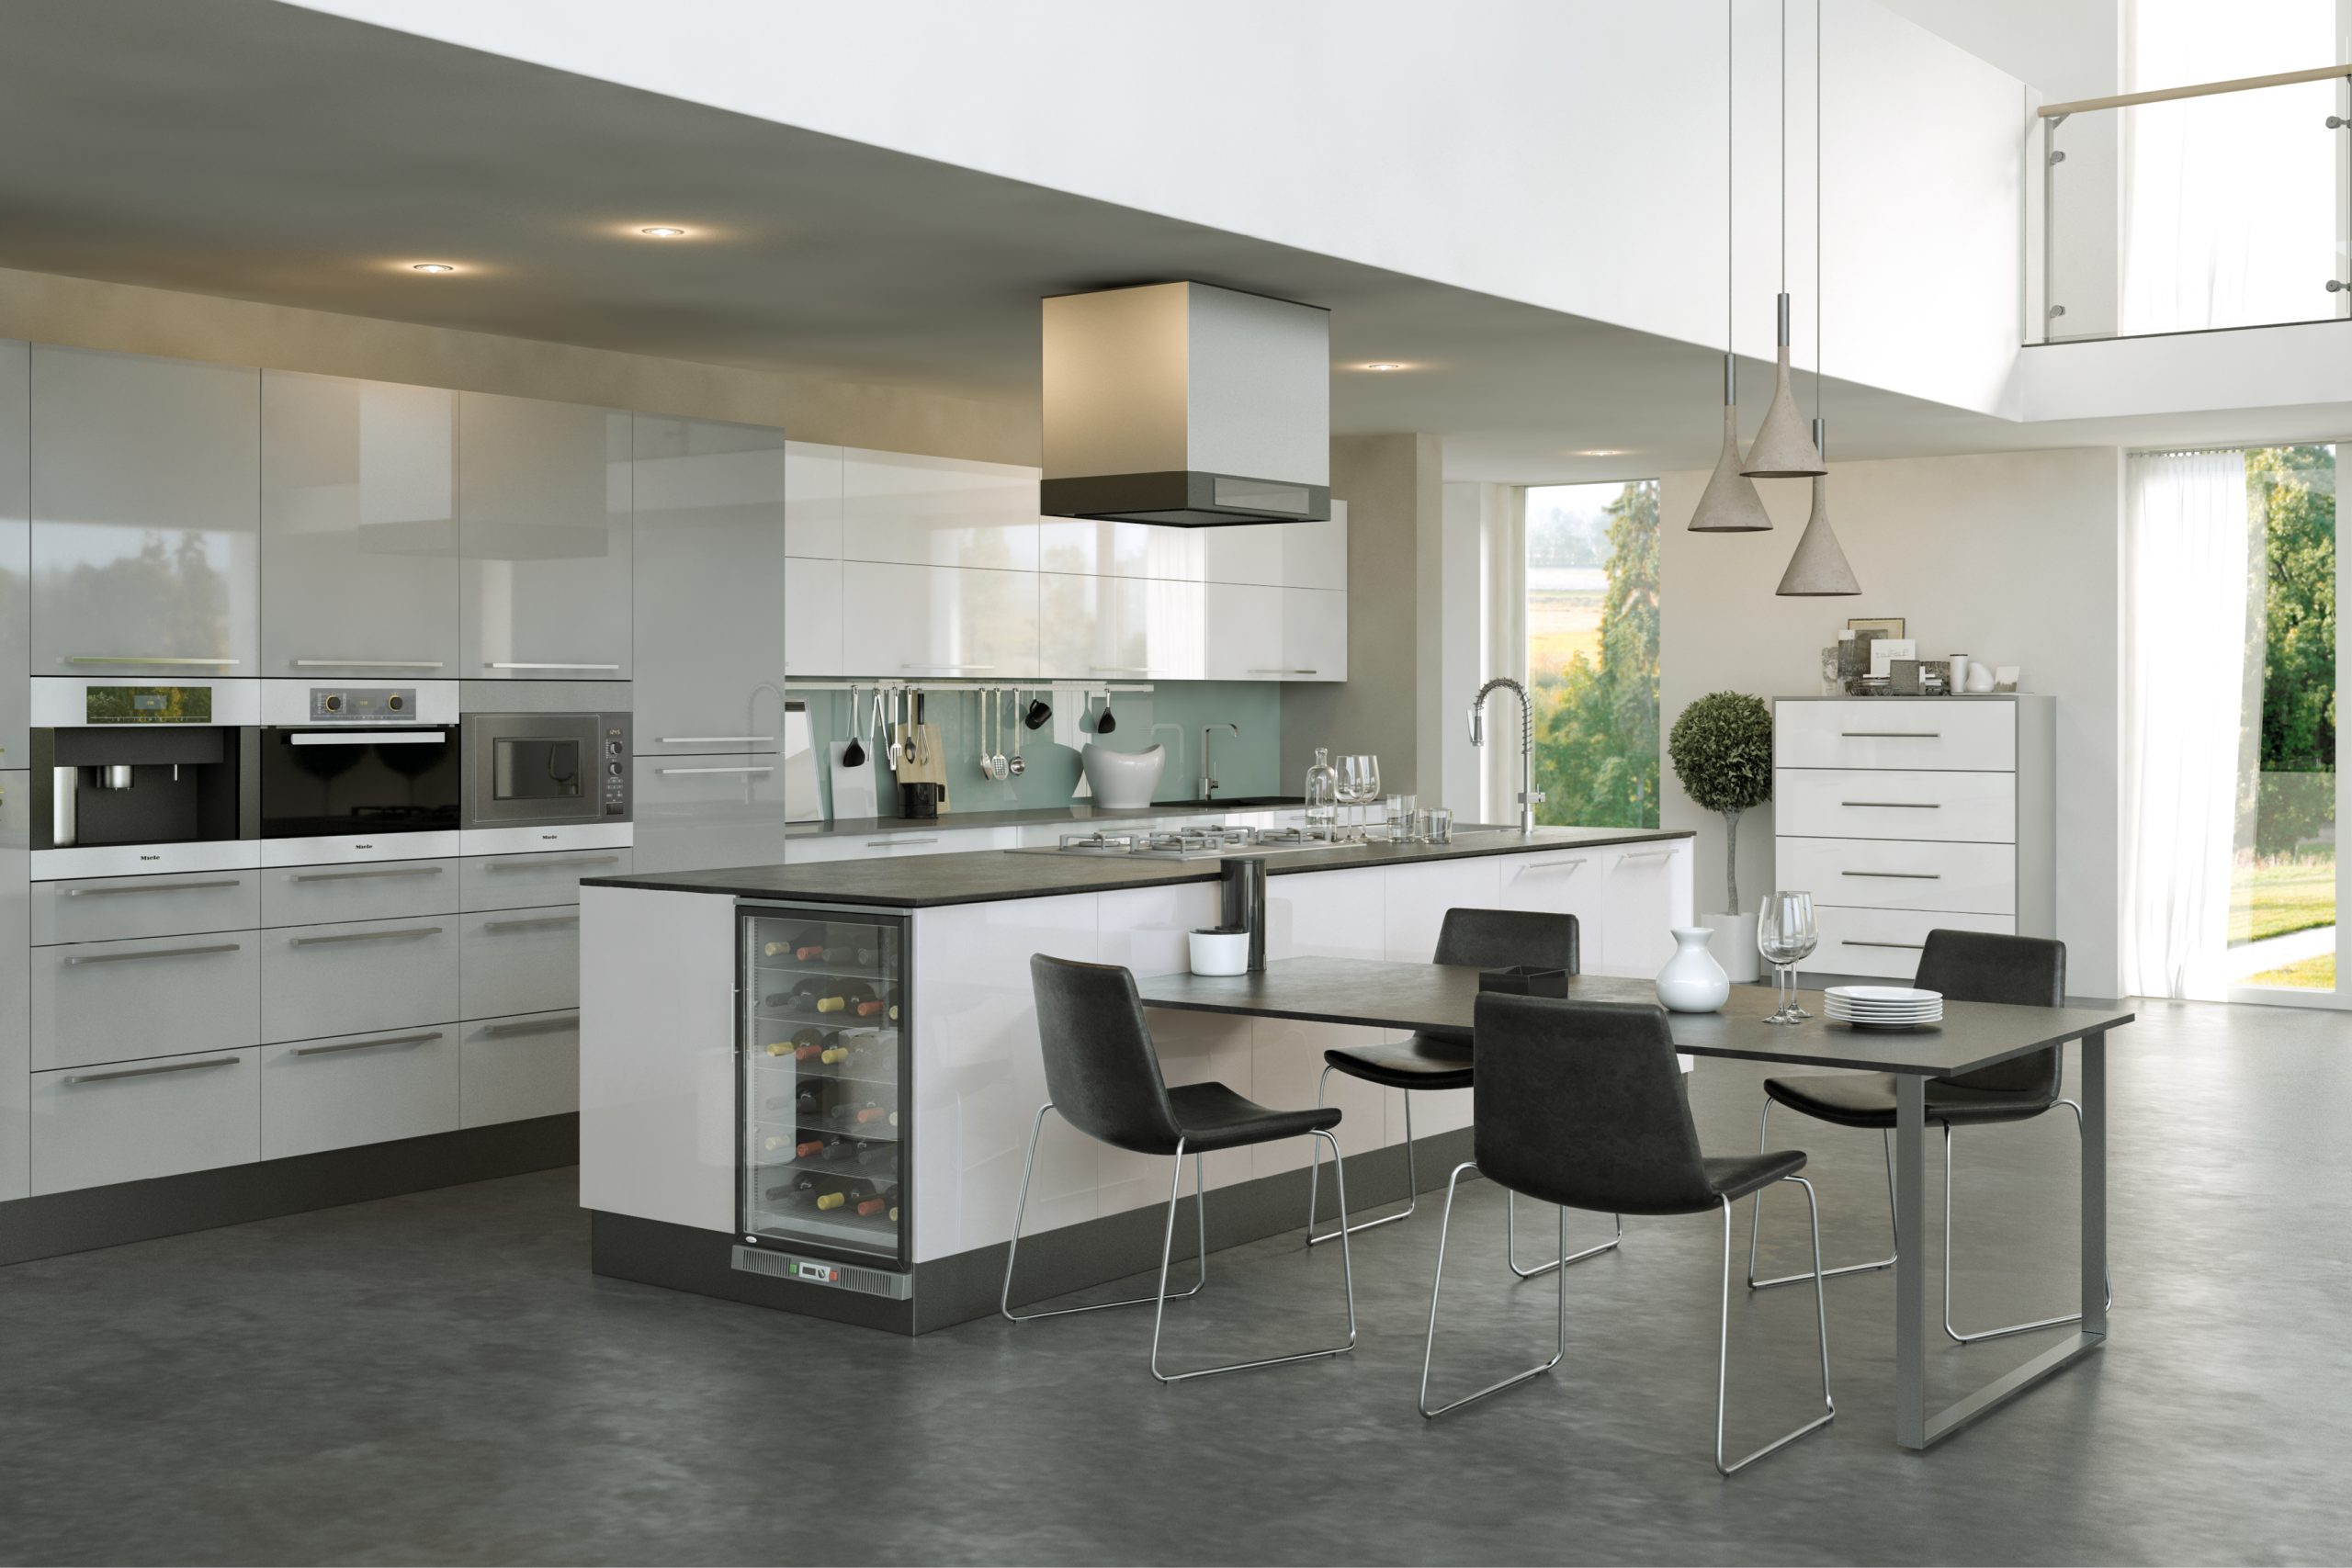 Firbeck Supergloss White and Supergloss Light Grey Kitchen